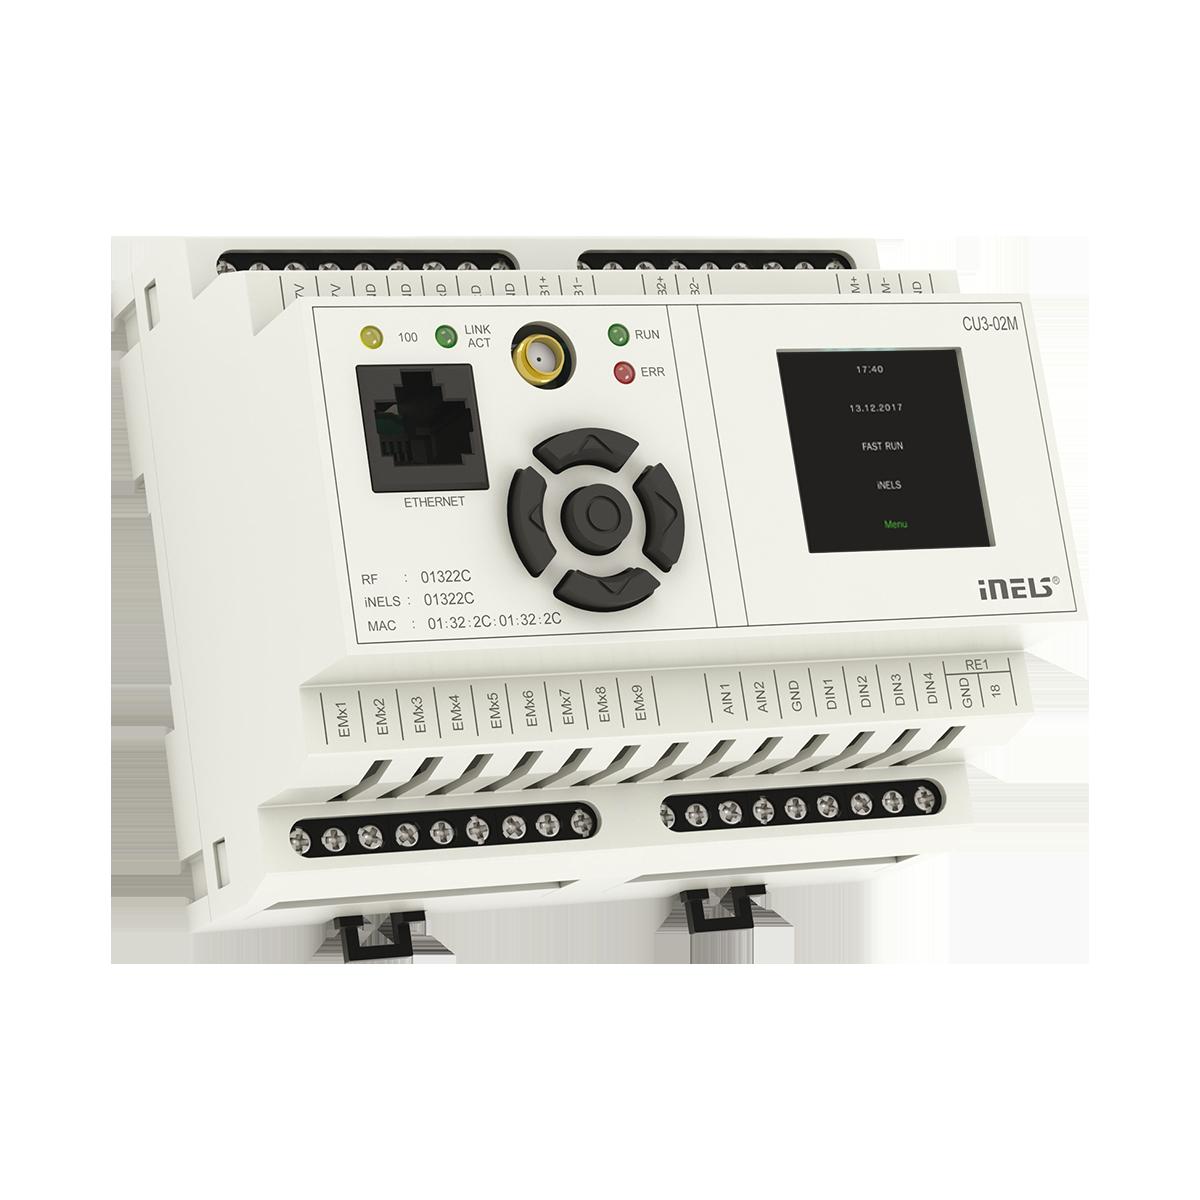 Central Unit Cu3 02m Elkoep Circuit Breaker Timer Interface Units Downloads